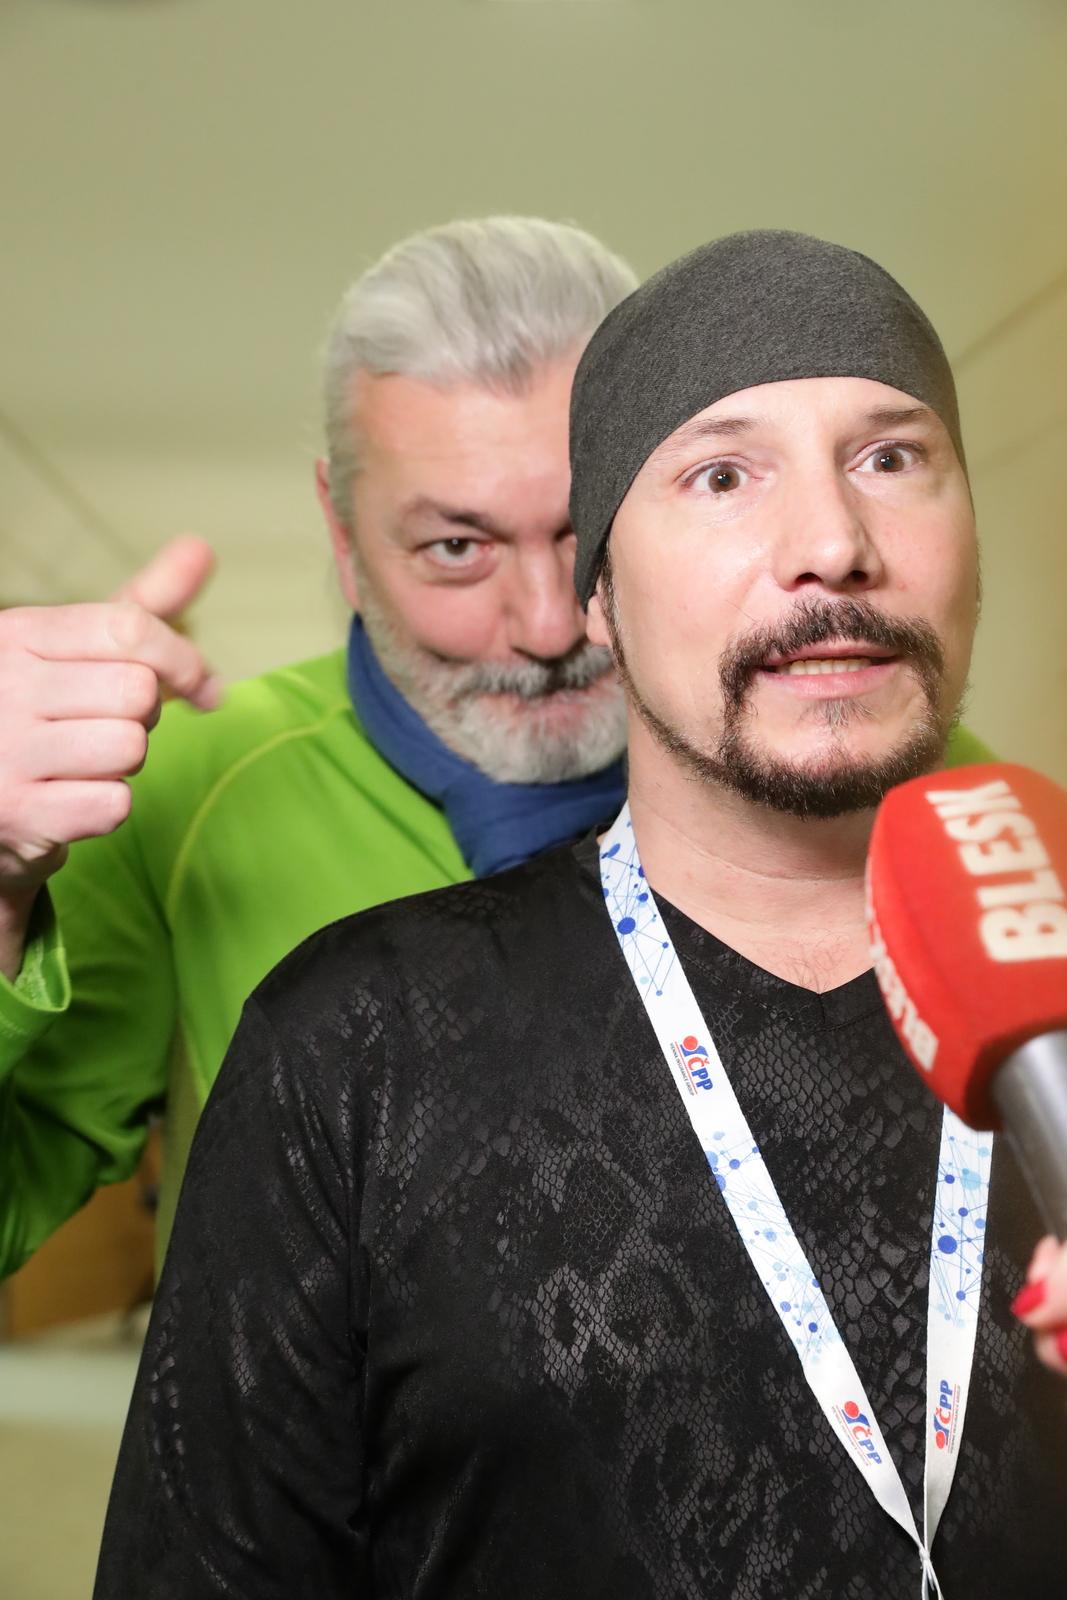 Pán démonů Daniel Hůlka Bohuše Matuše trochu pozlobil